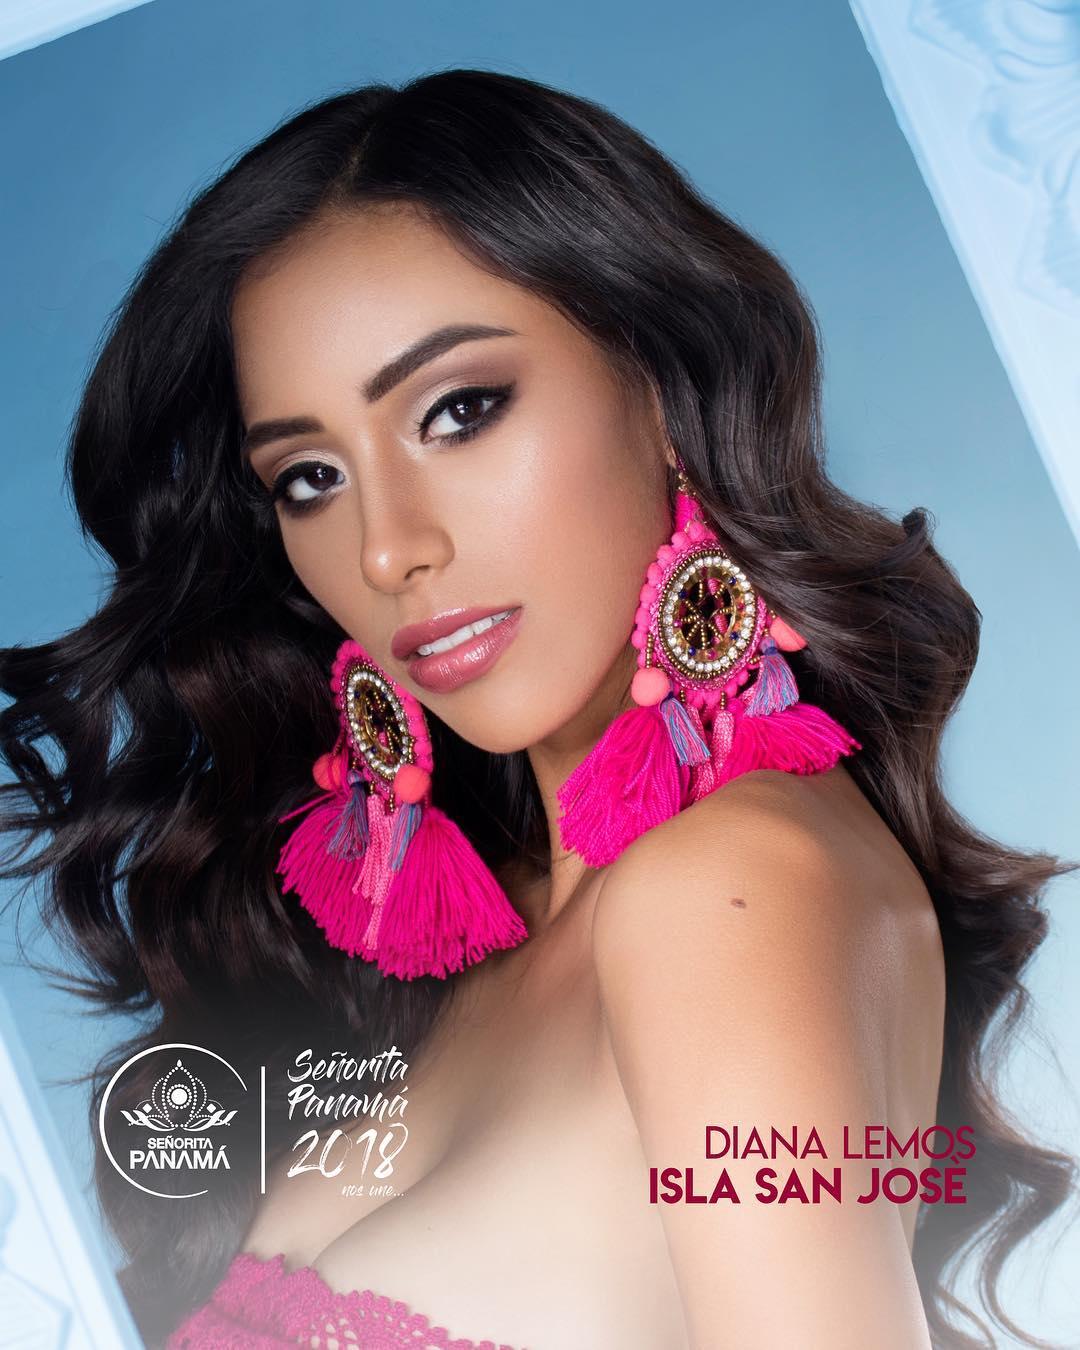 señorita miss colombia 2018 candidates candidatas contestants delegates Miss Isla San José Diana Lemos